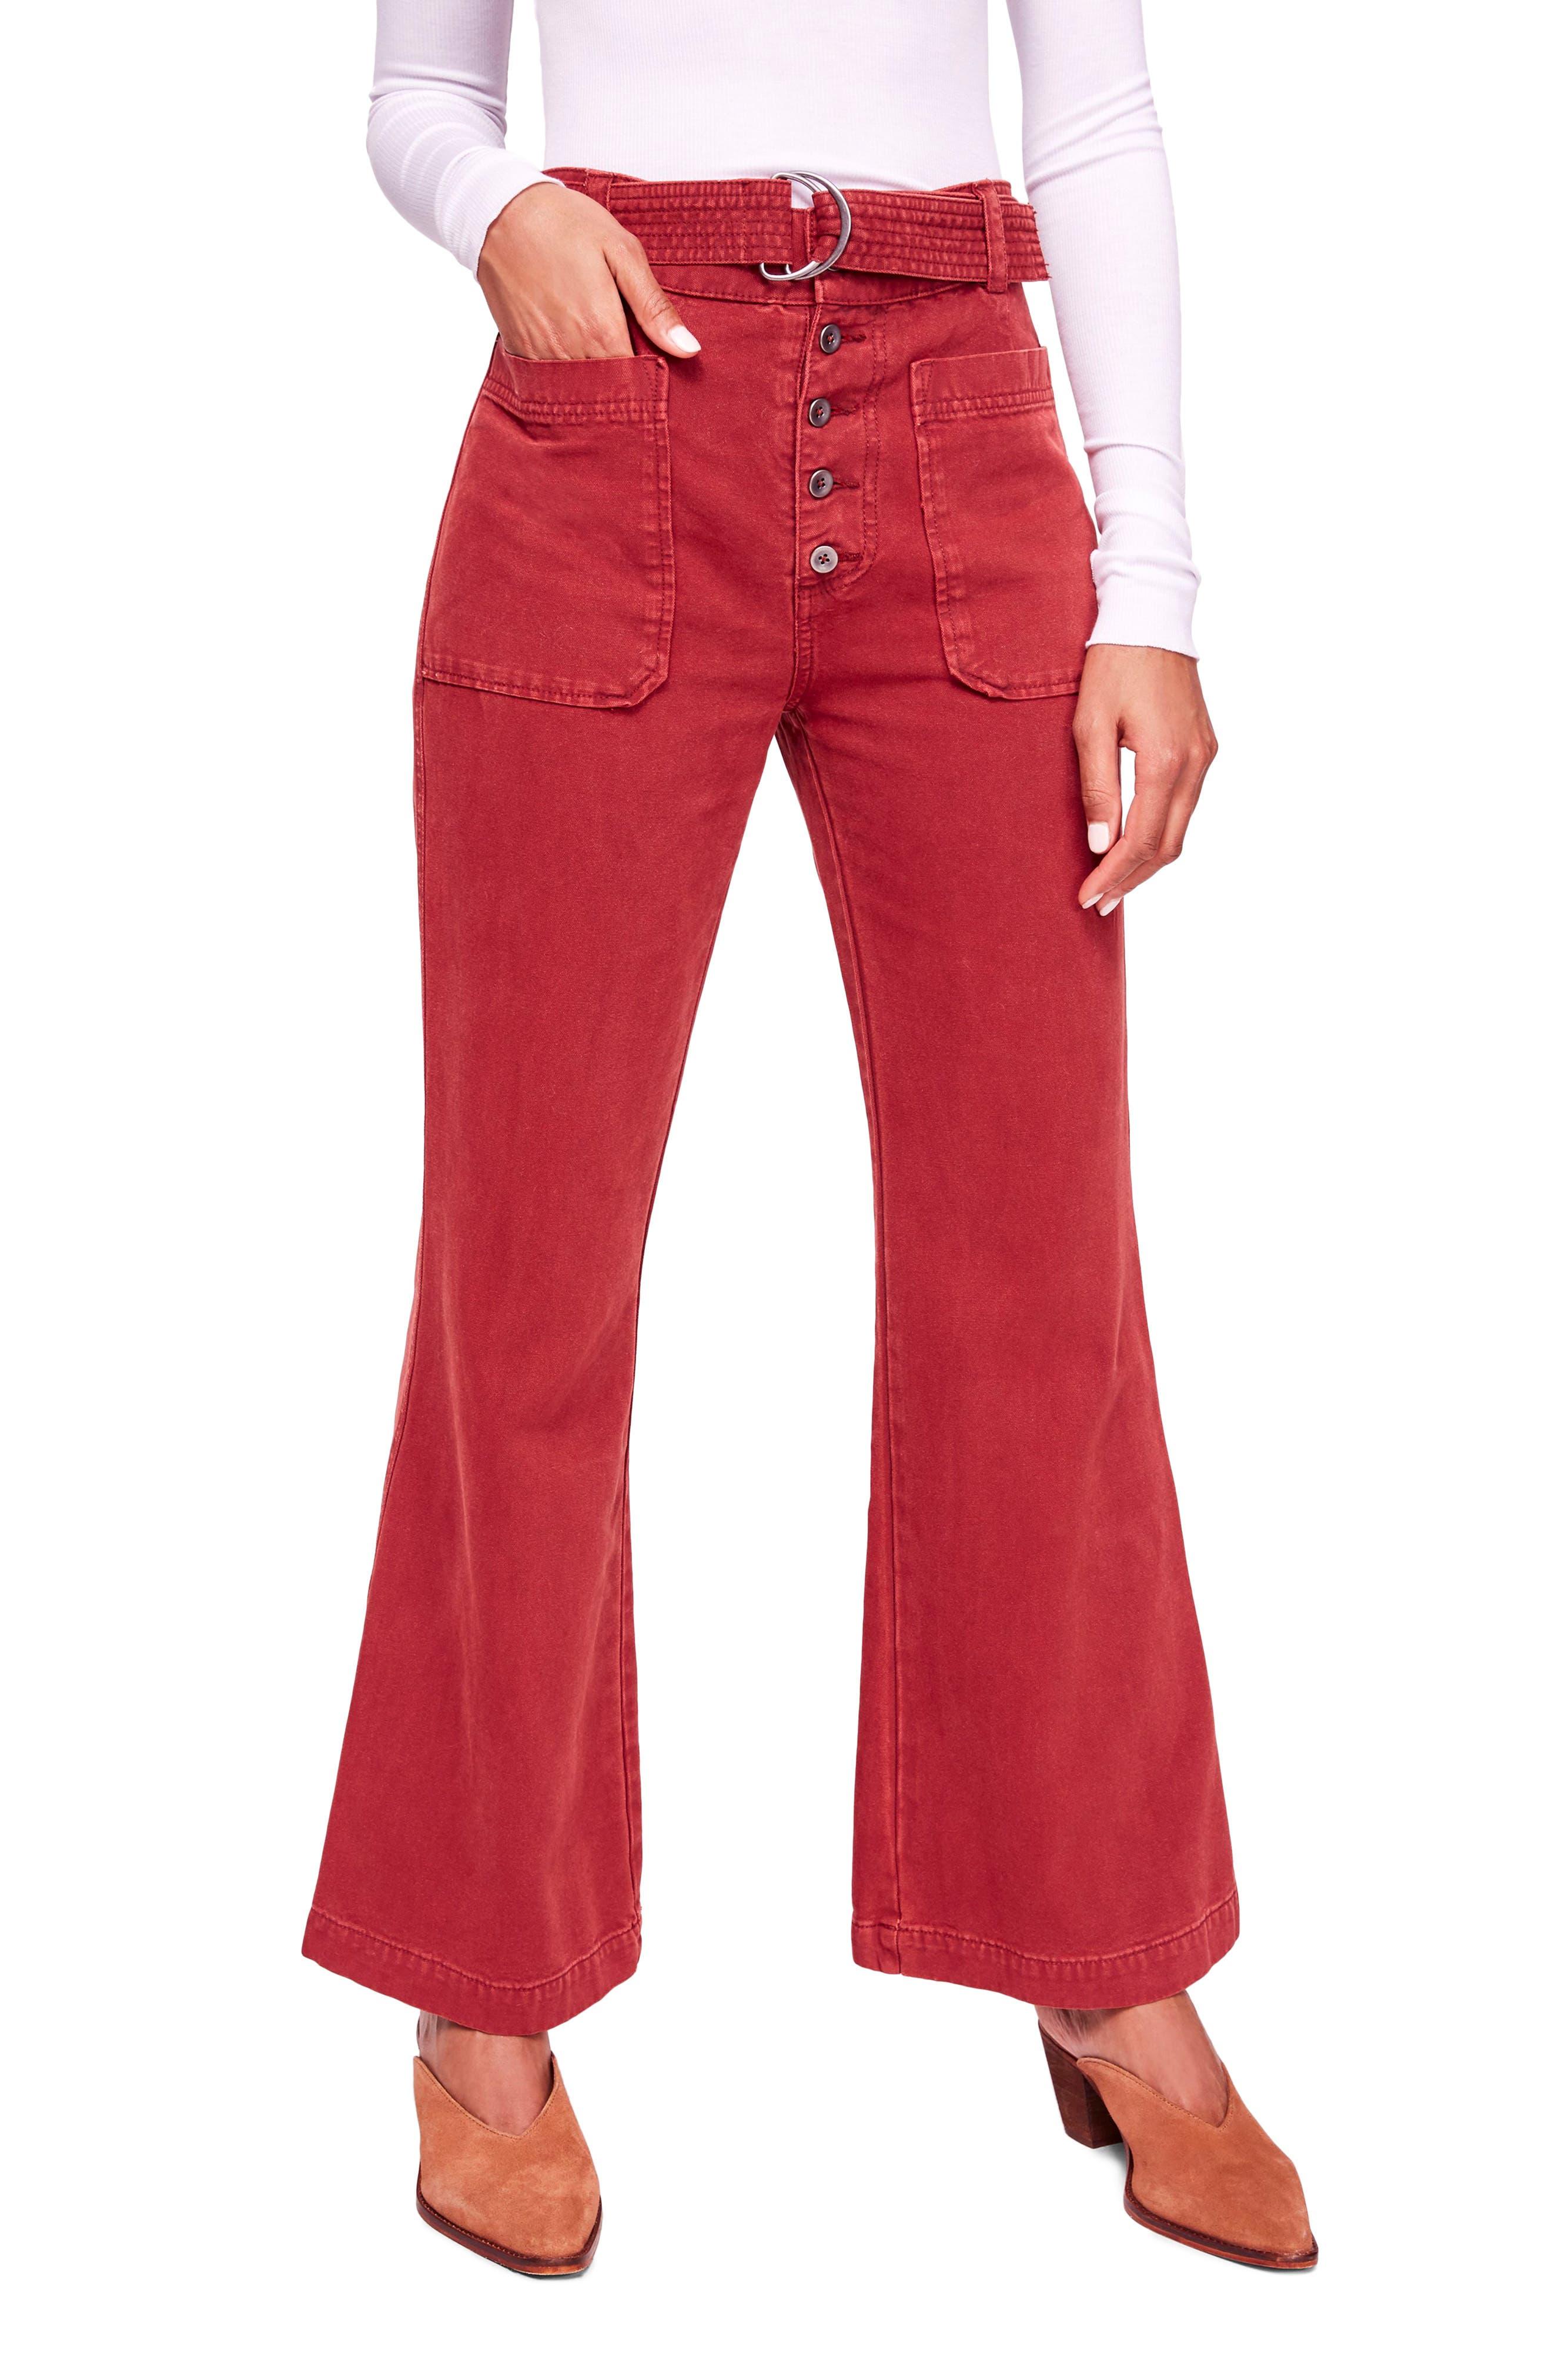 Corin Mod Slim Flare Pants,                             Main thumbnail 1, color,                             WINE